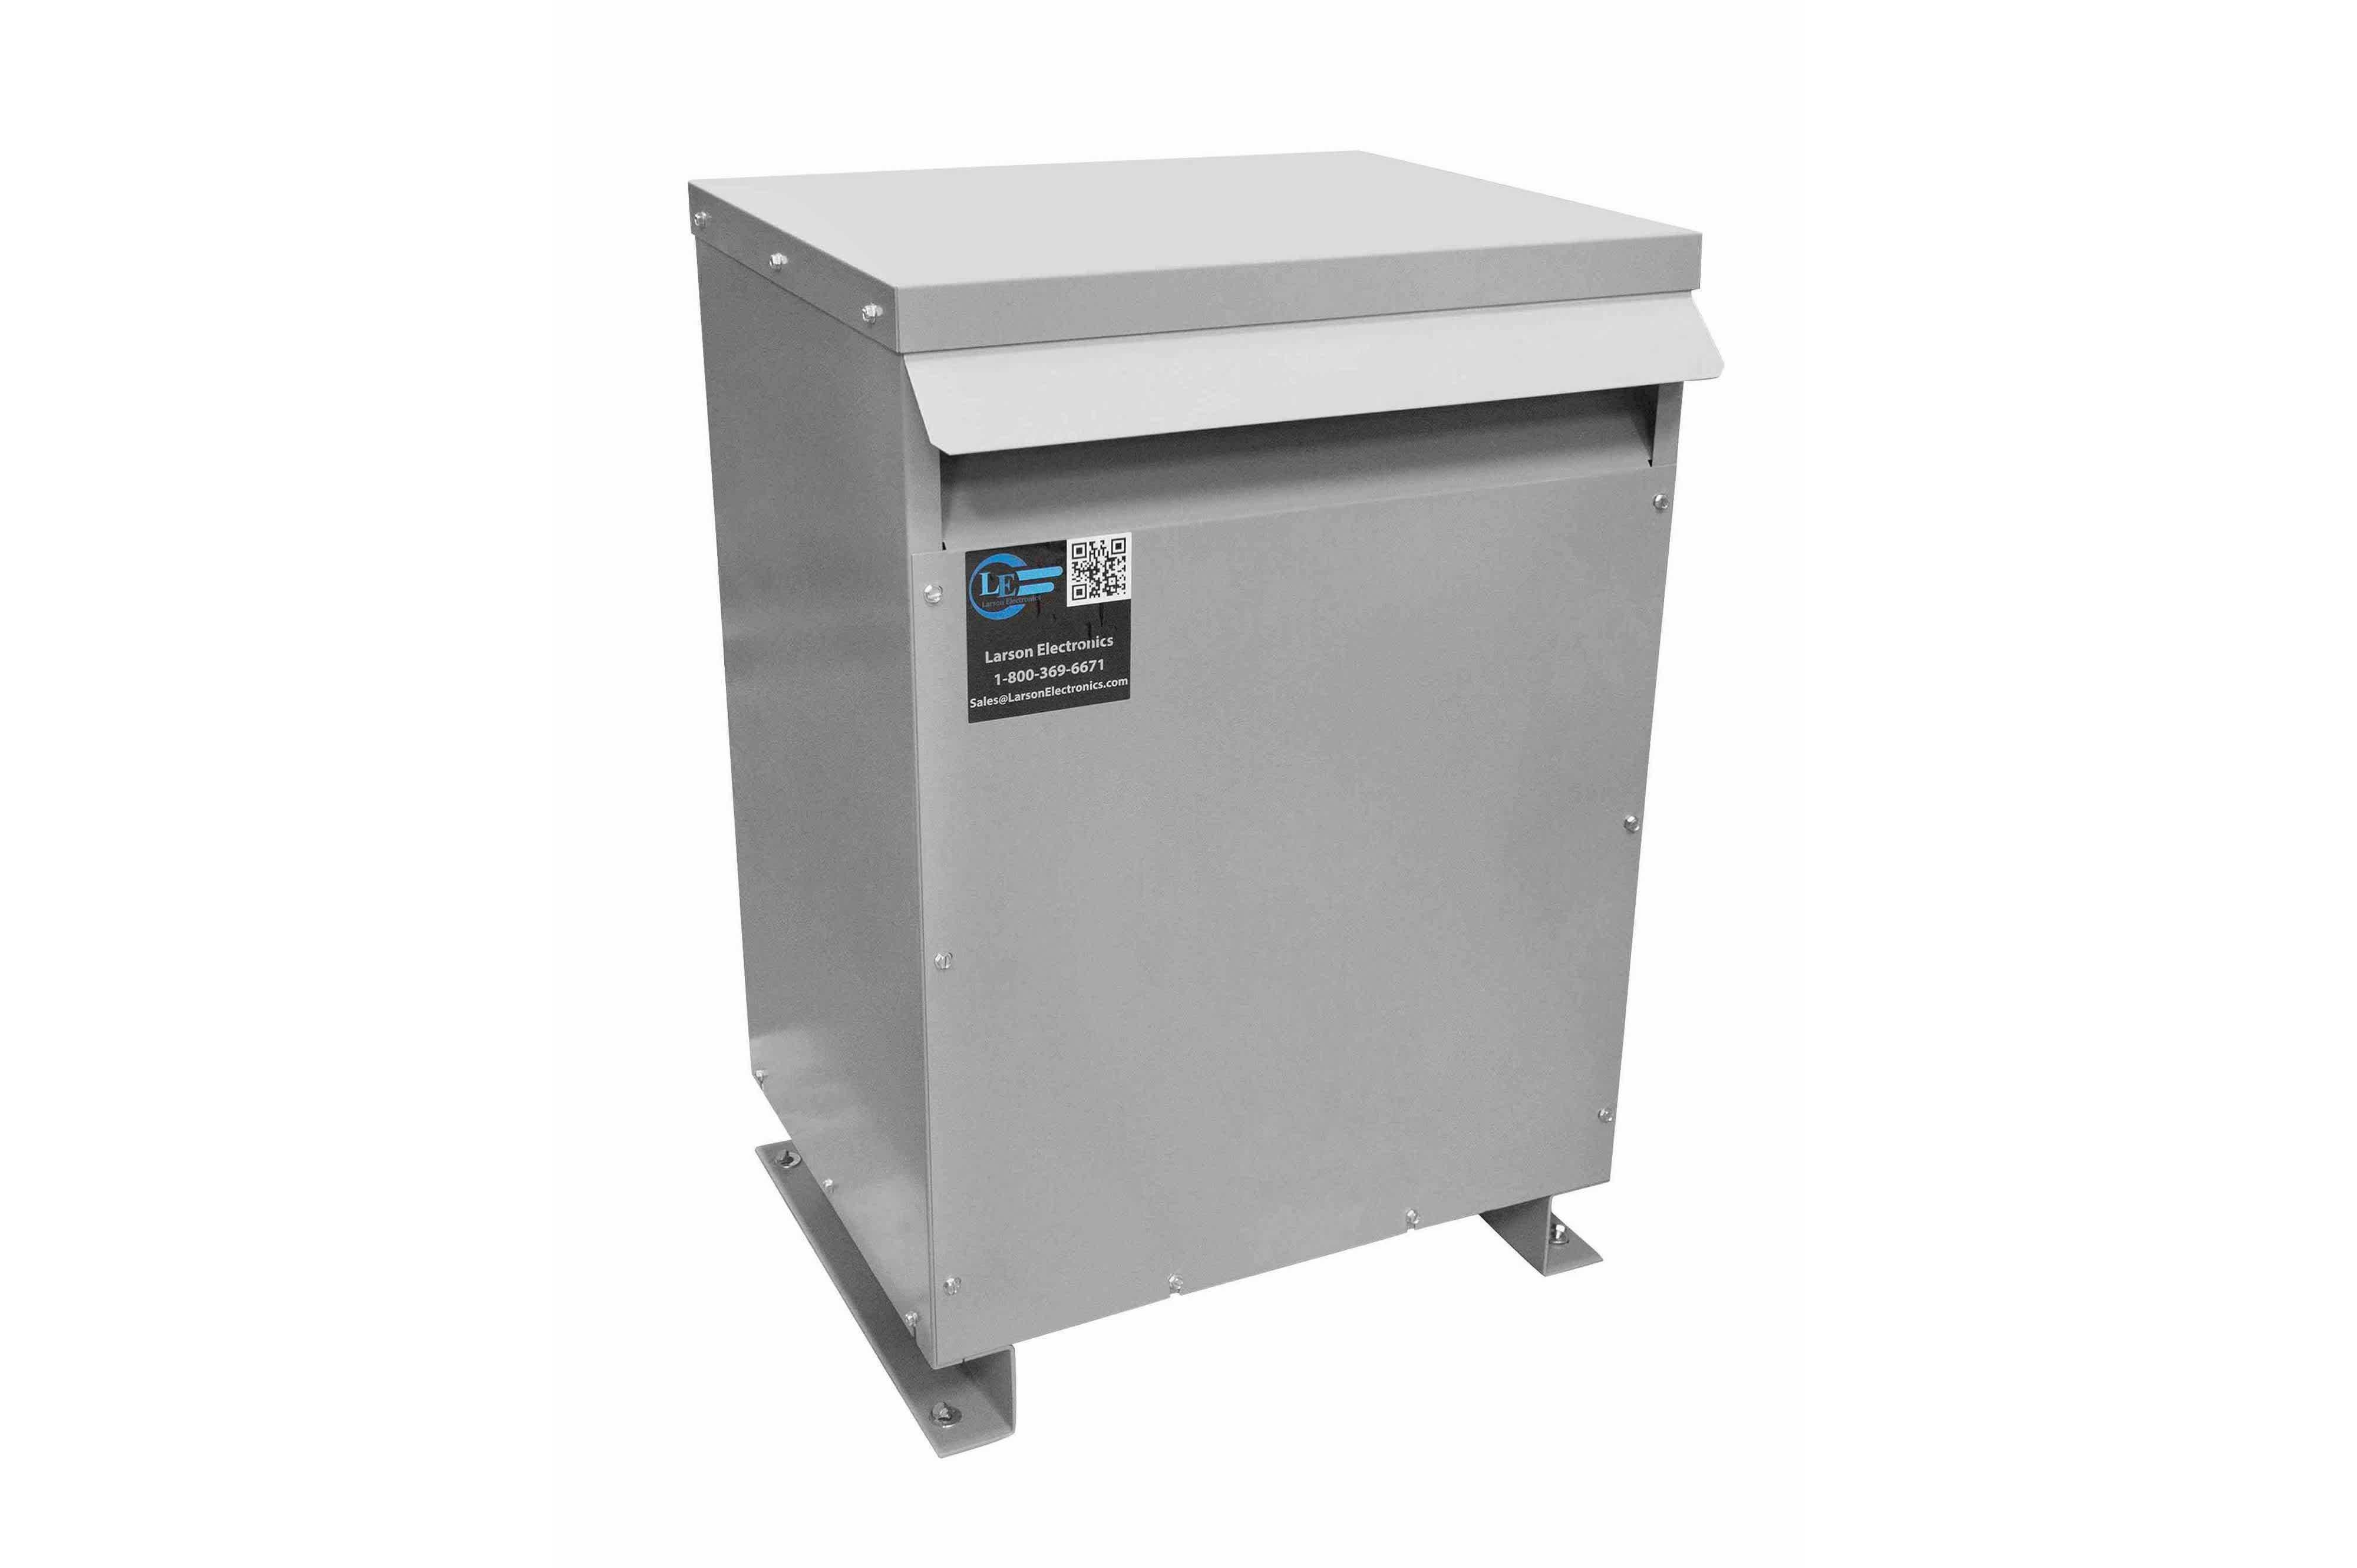 26 kVA 3PH Isolation Transformer, 460V Wye Primary, 240V Delta Secondary, N3R, Ventilated, 60 Hz